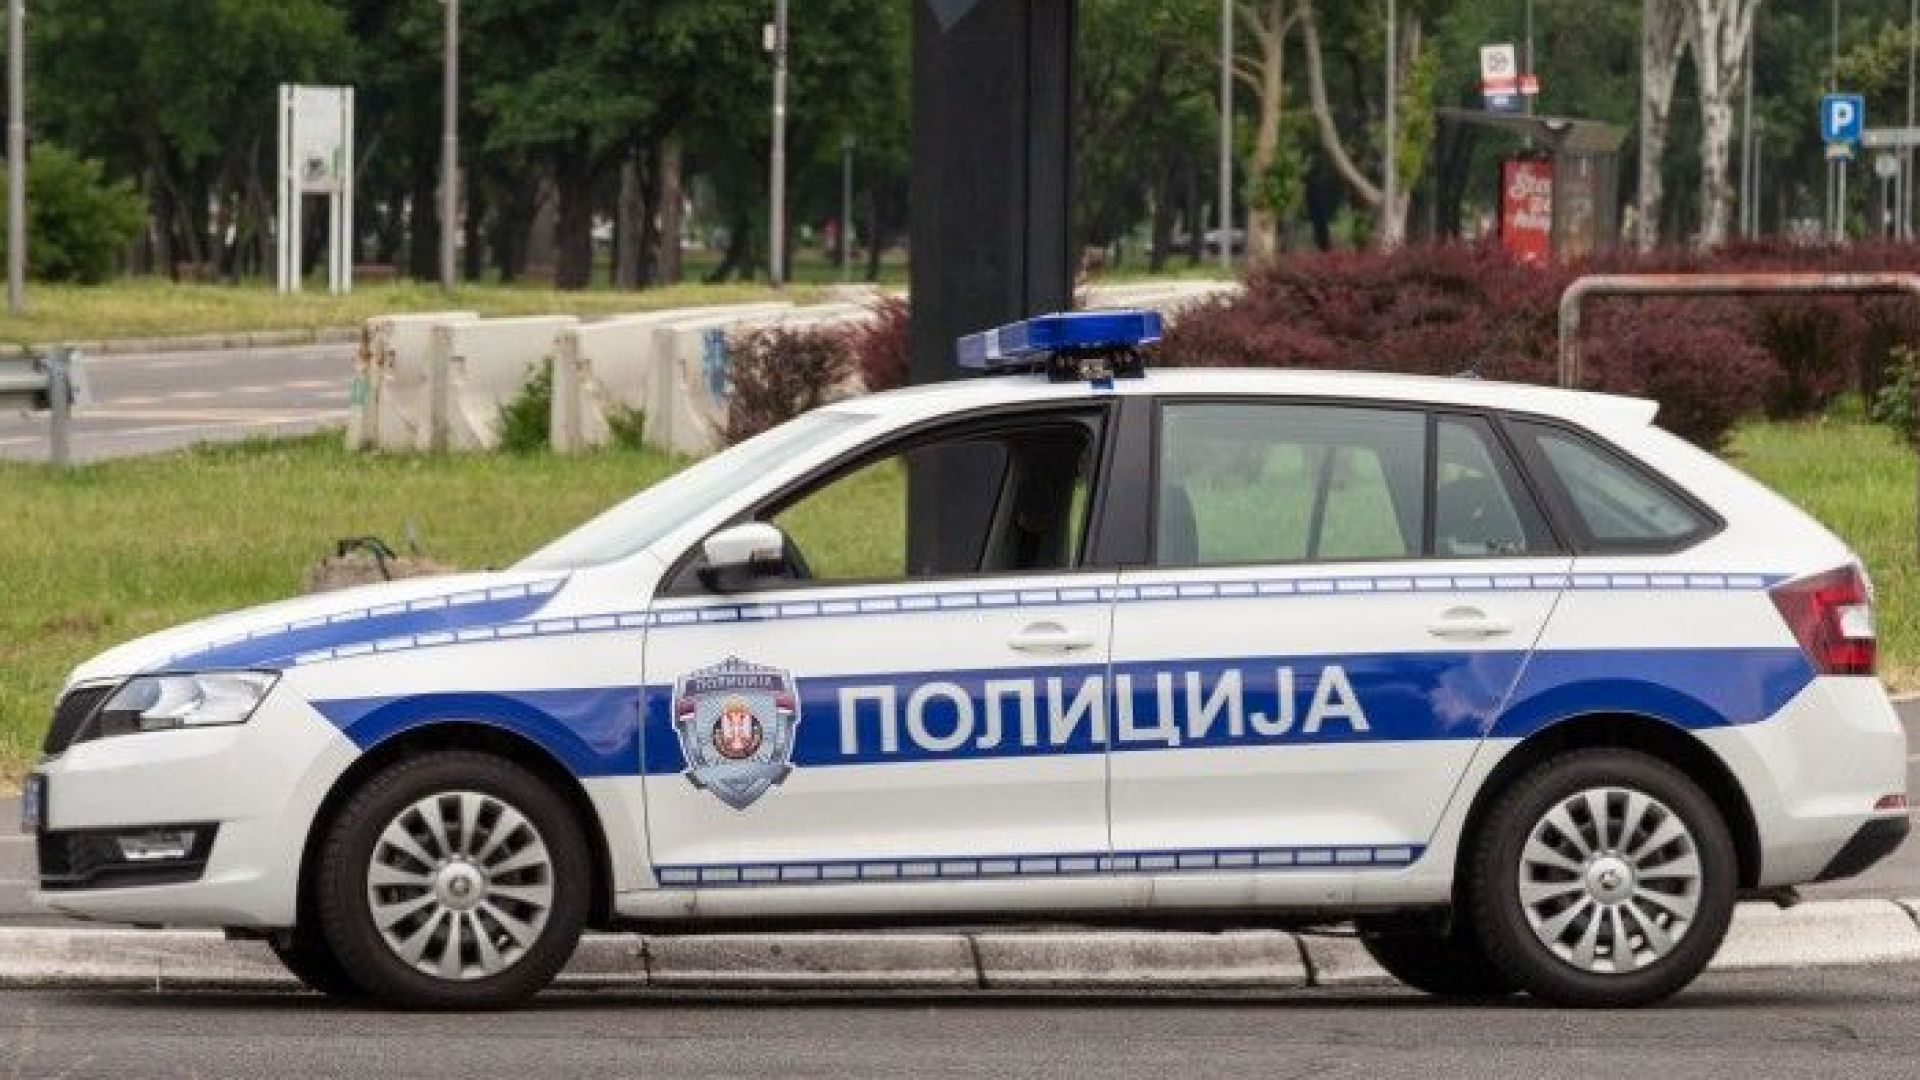 Бивш адвокат на Слободан Милошевич е убит в Белград